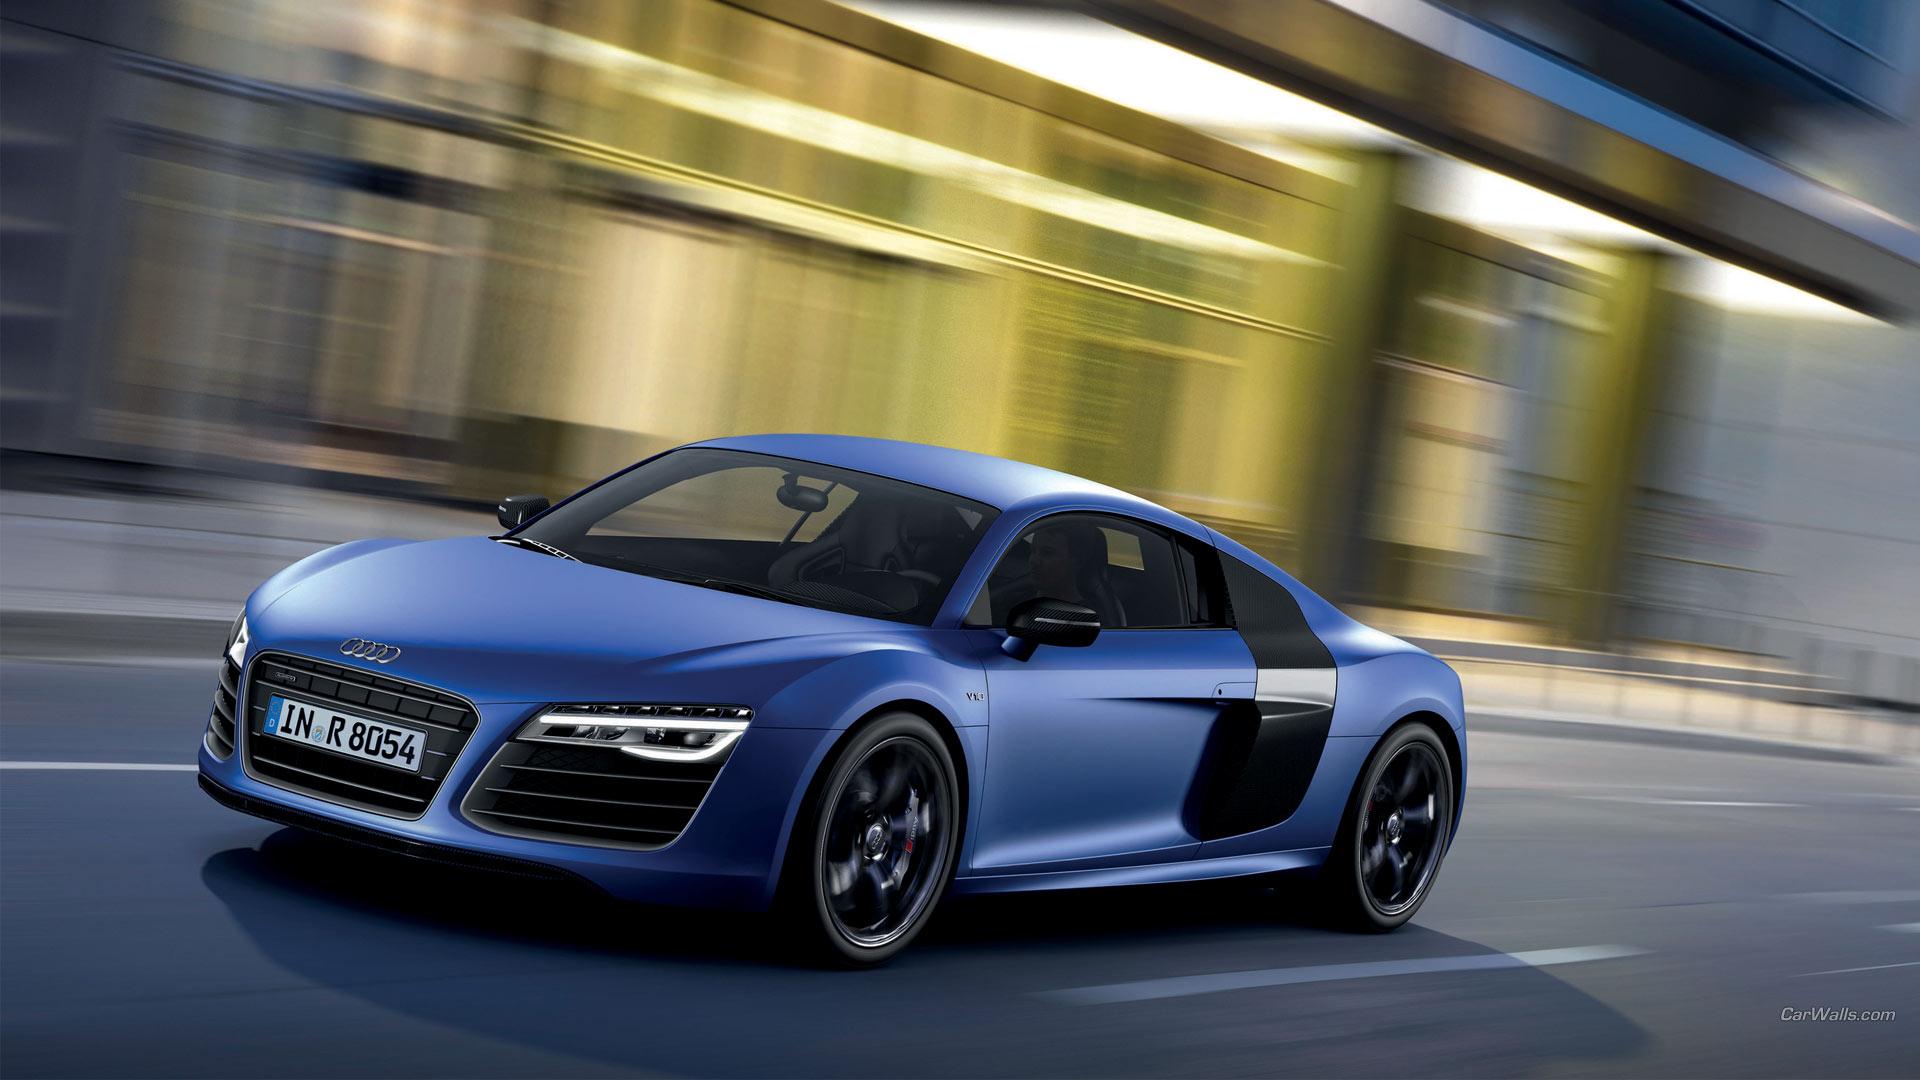 Best Audi Car Photo Hd Wallpaper Download